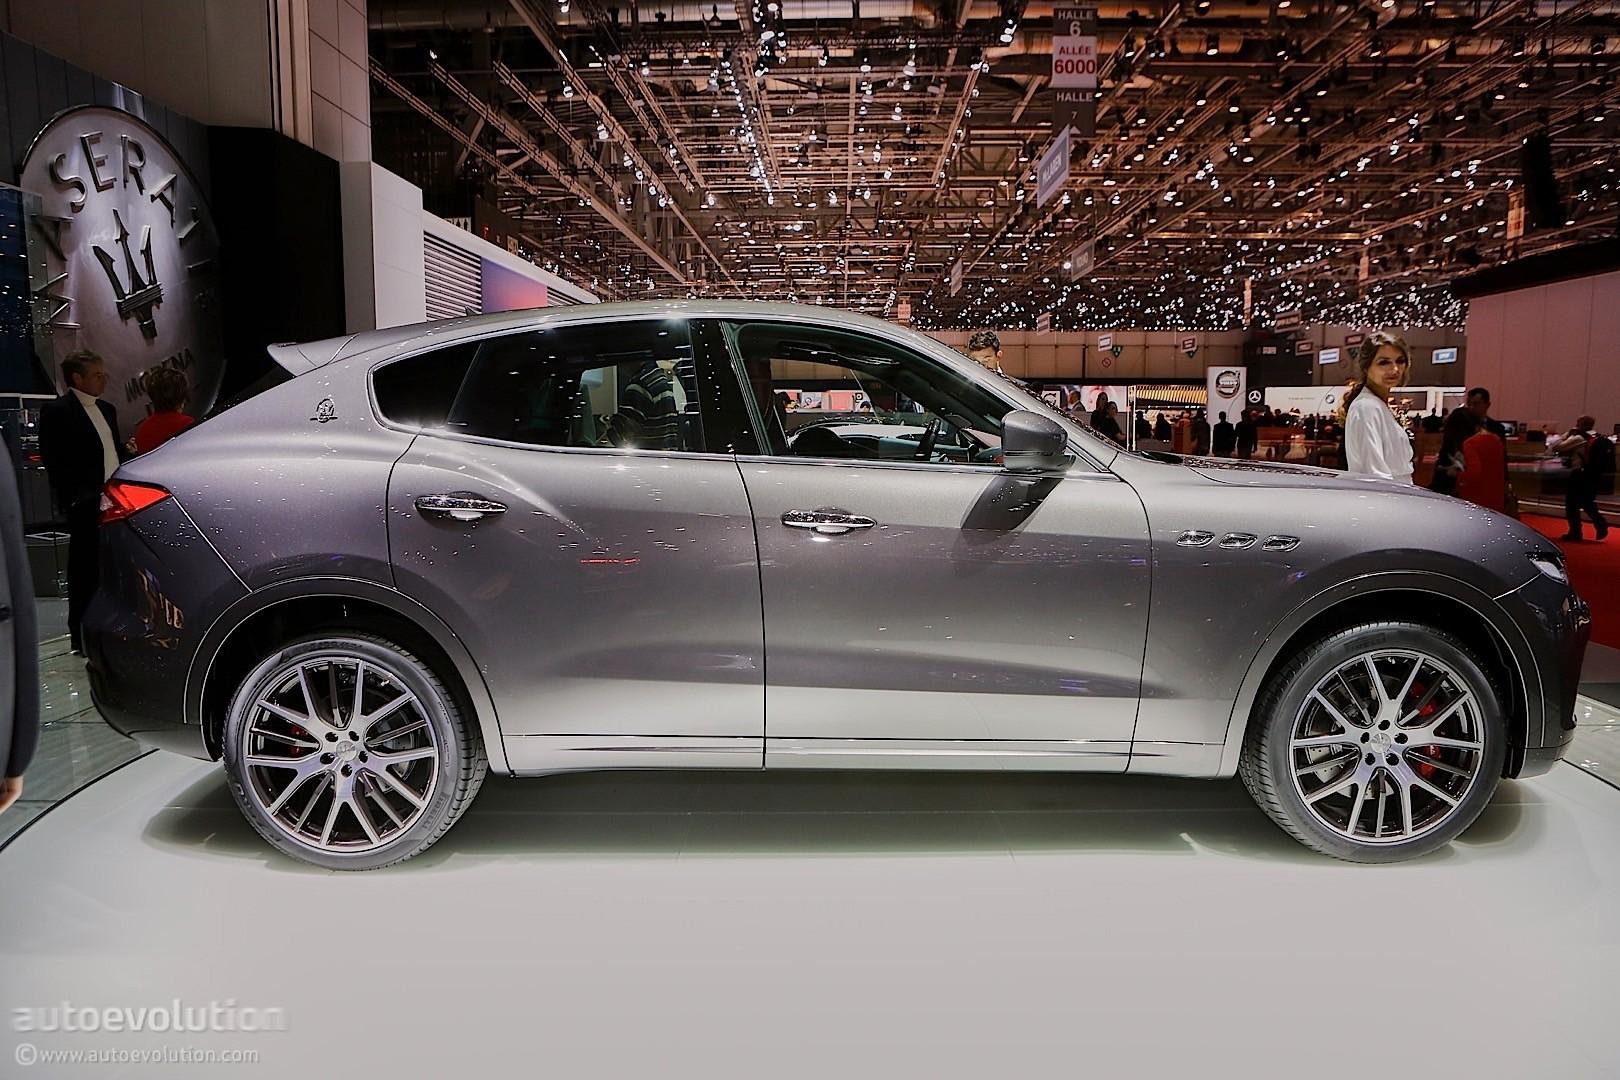 Maserati Levante Suv Looks Like A Ghibli On Stilts In